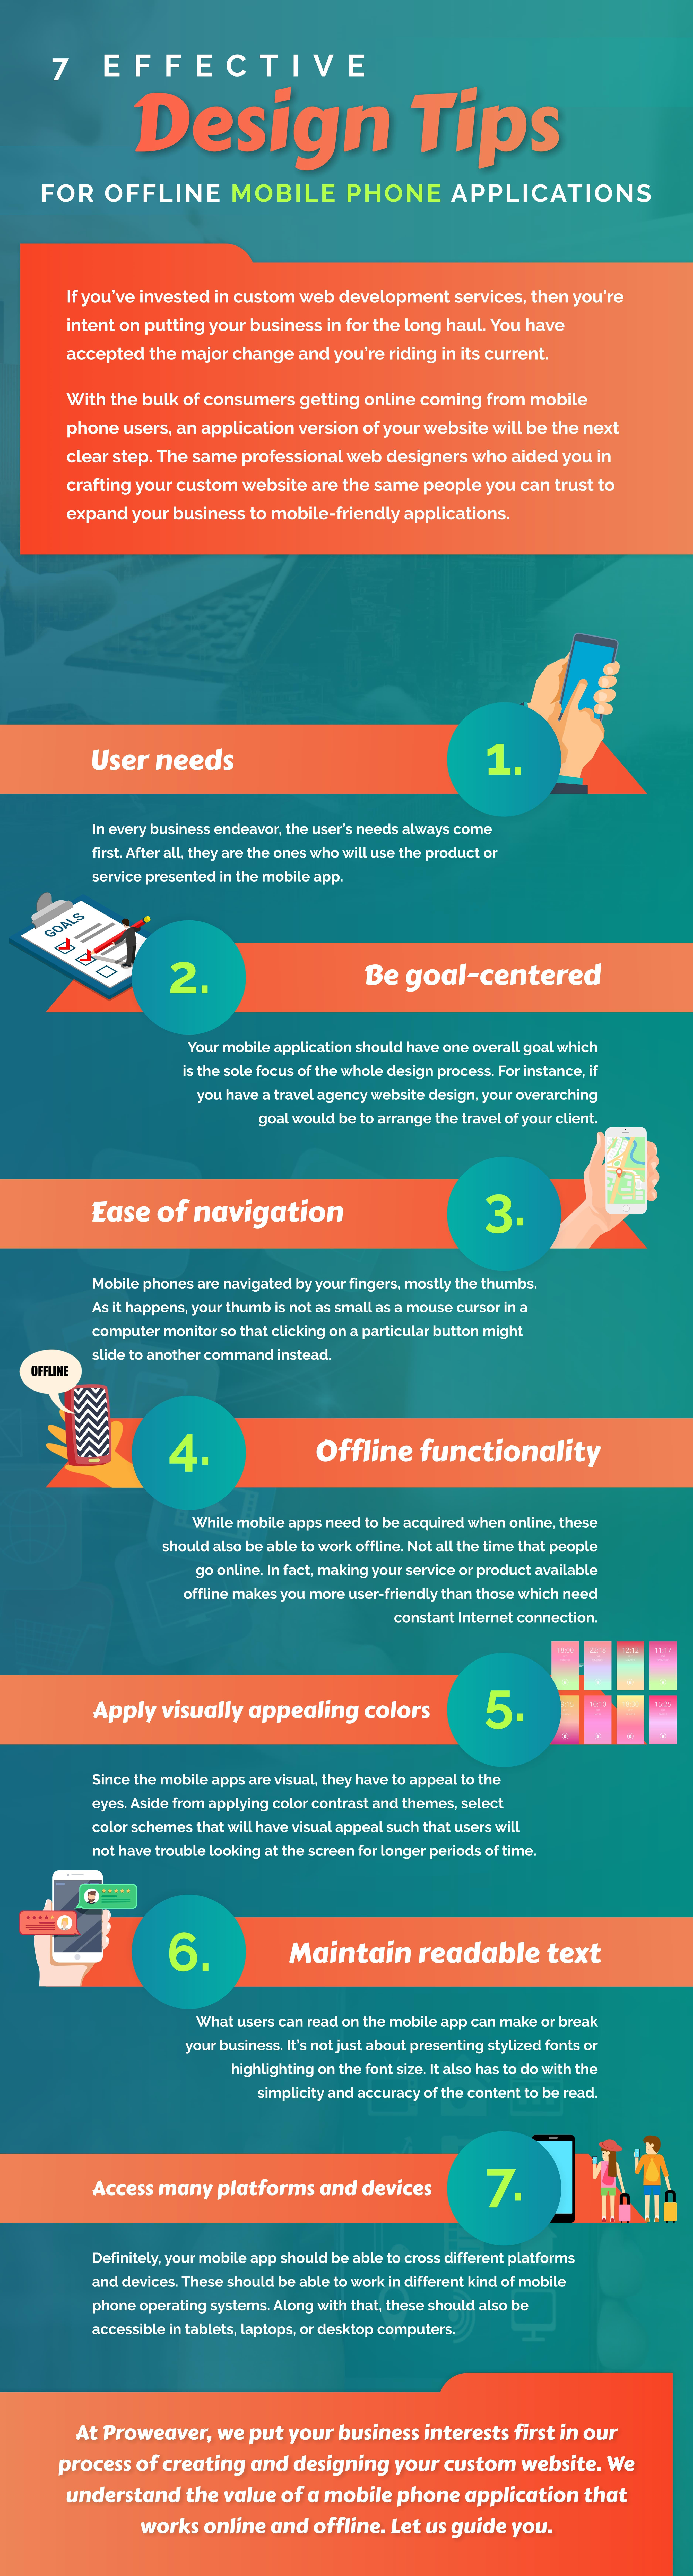 7 Effective Design Tips for Offline Mobile Phone Applications